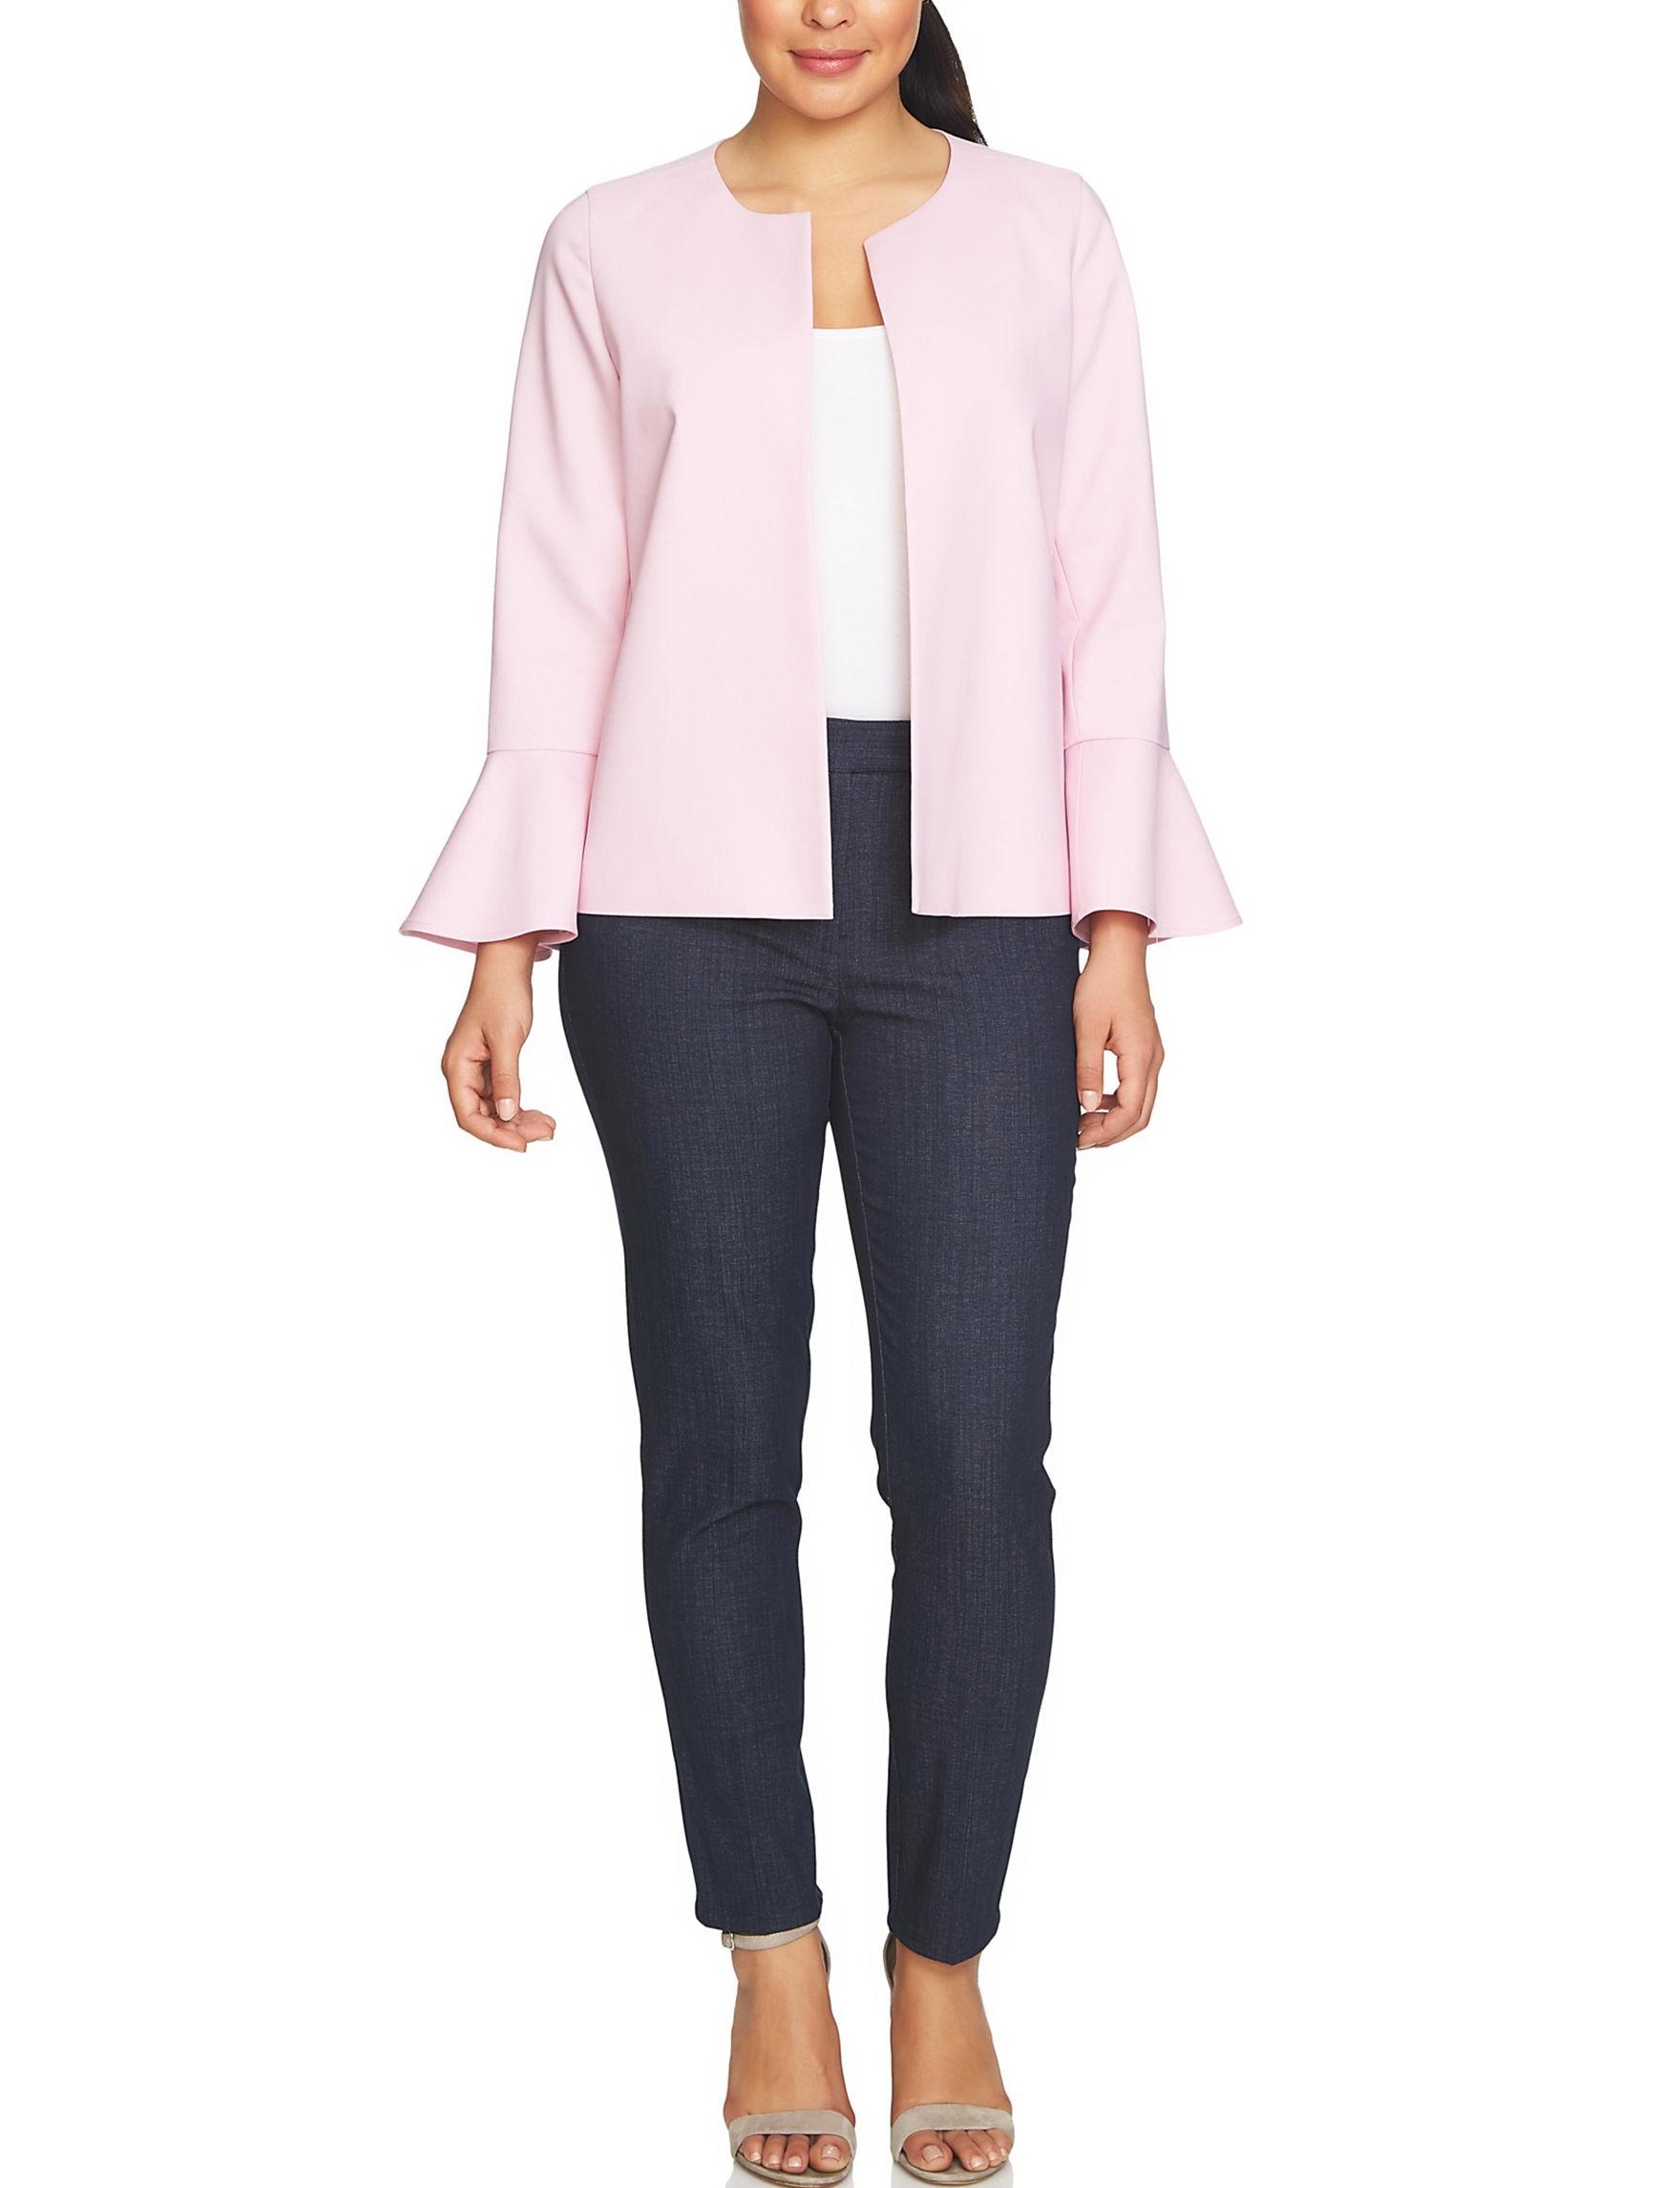 Chaus Pink Lightweight Jackets & Blazers